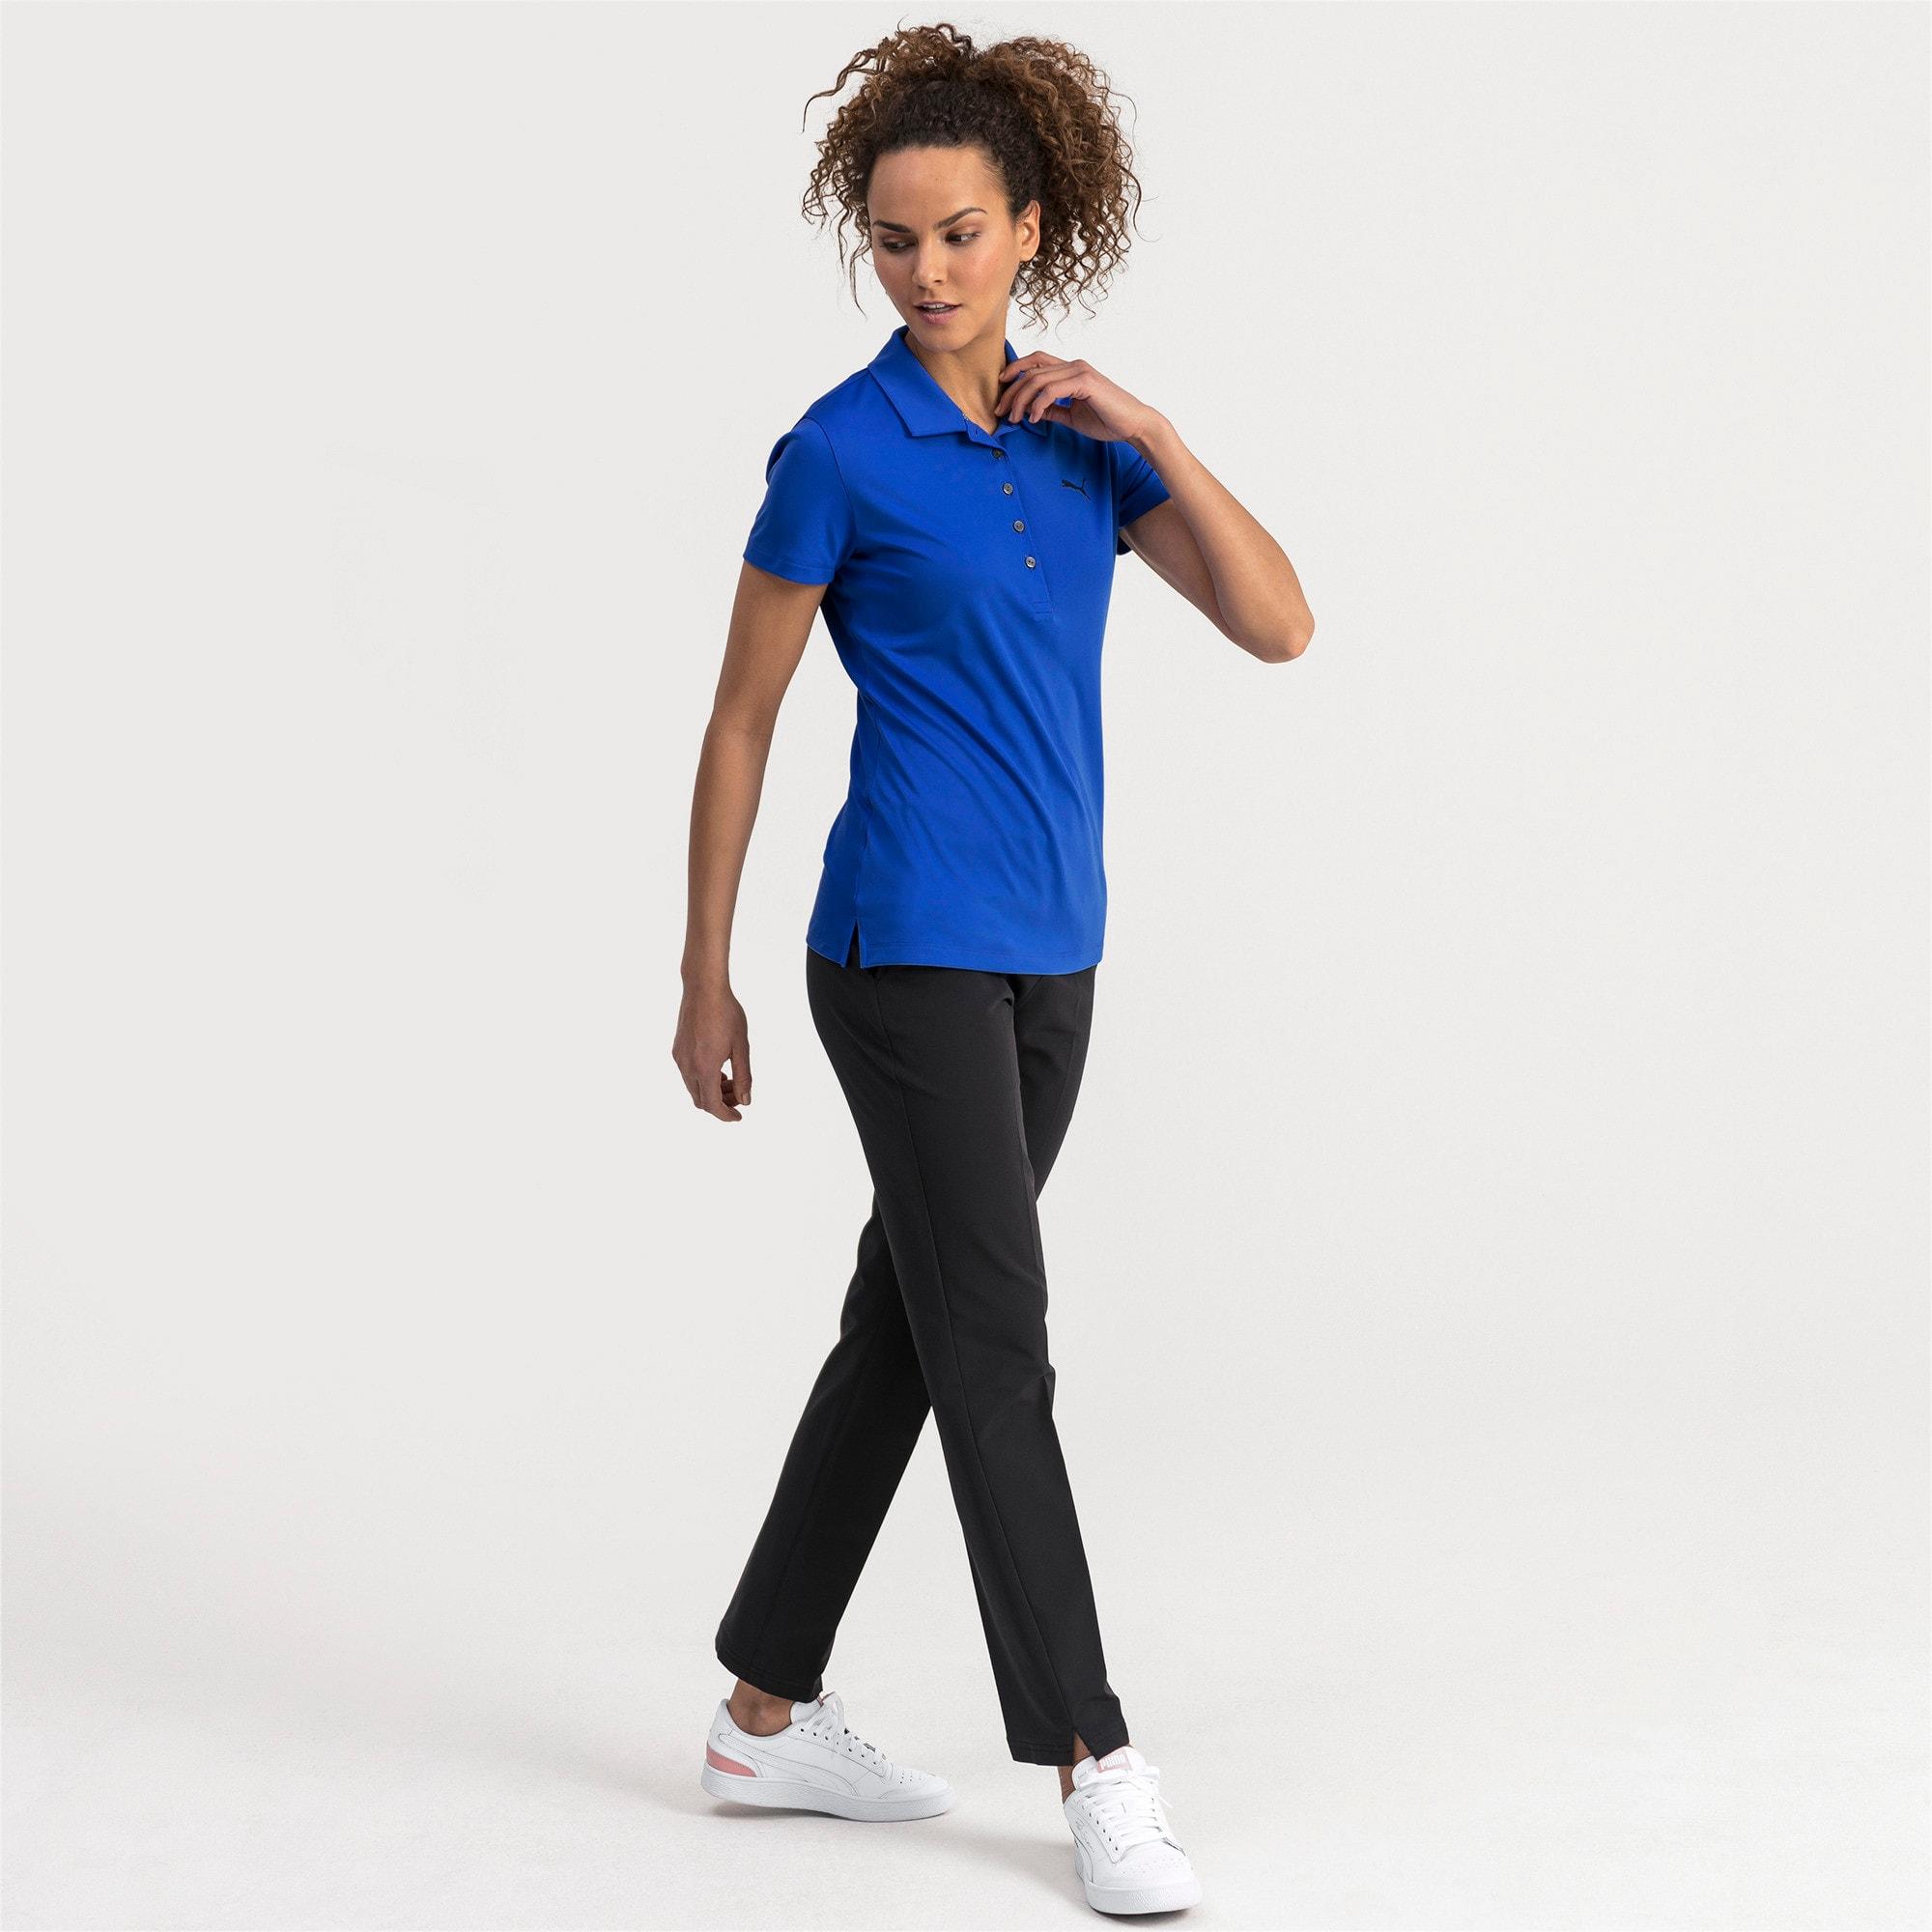 Thumbnail 3 of Golfpoloshirts voor dames, Dazzling Blue, medium